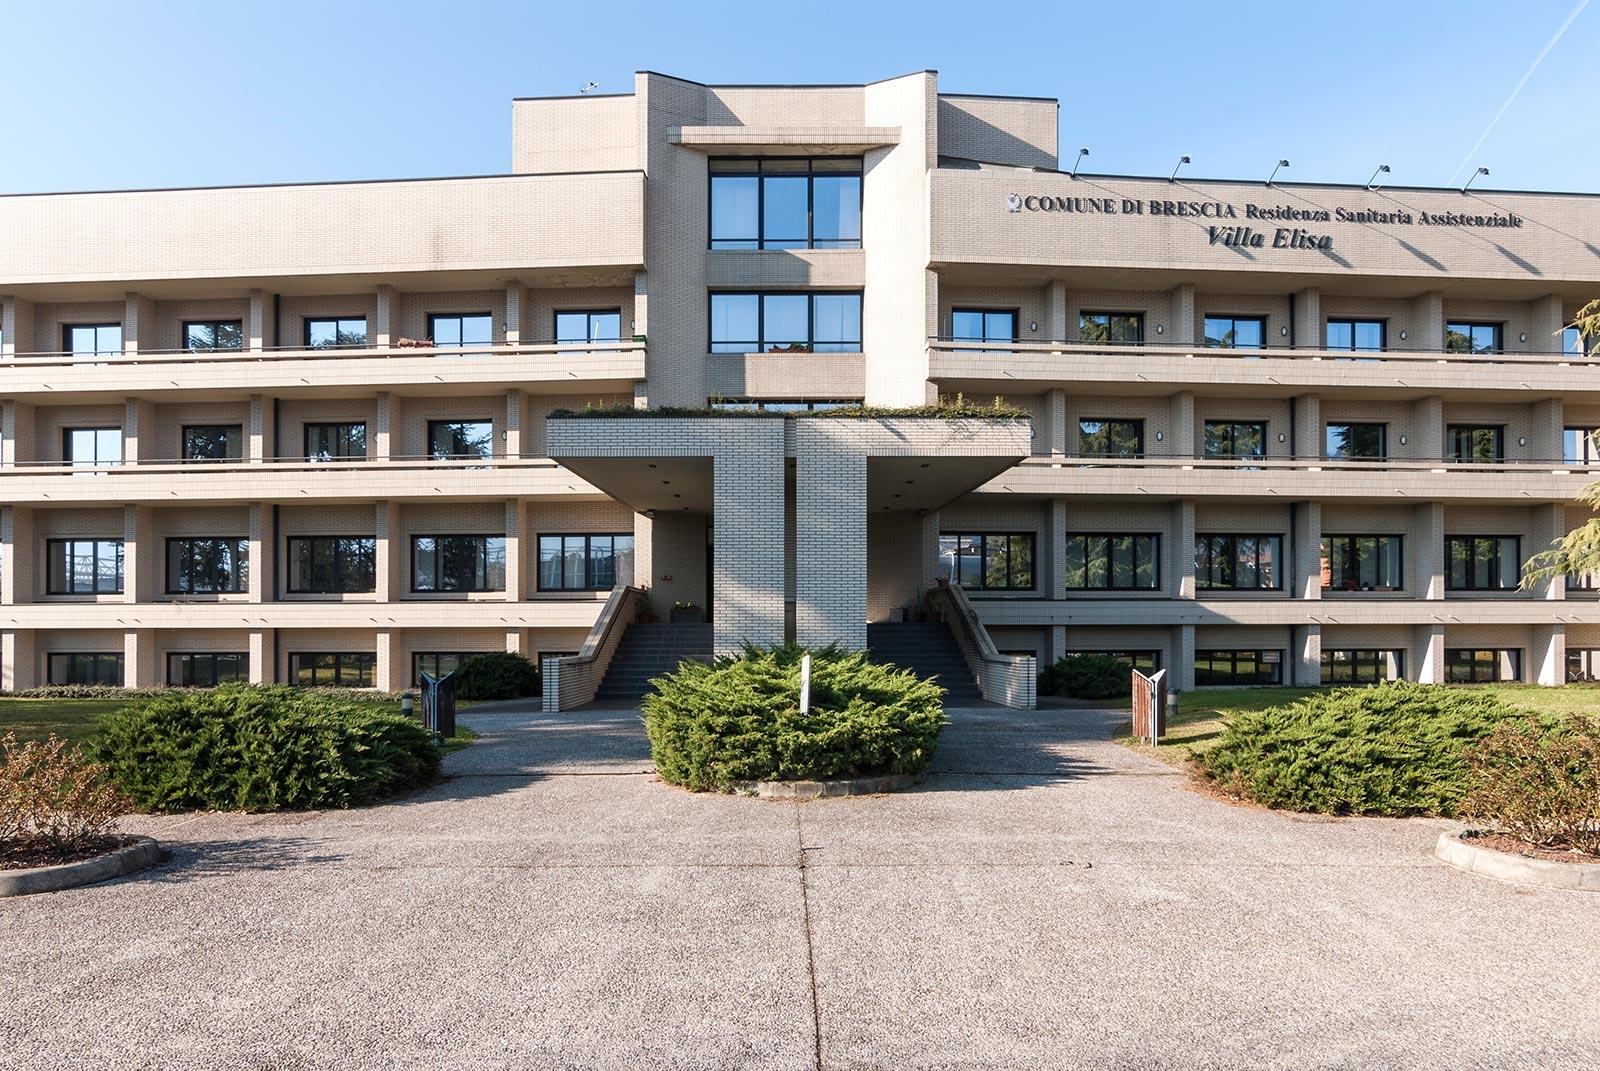 Rsa Villa Elisa Fondazione Brescia Solidale Onlus